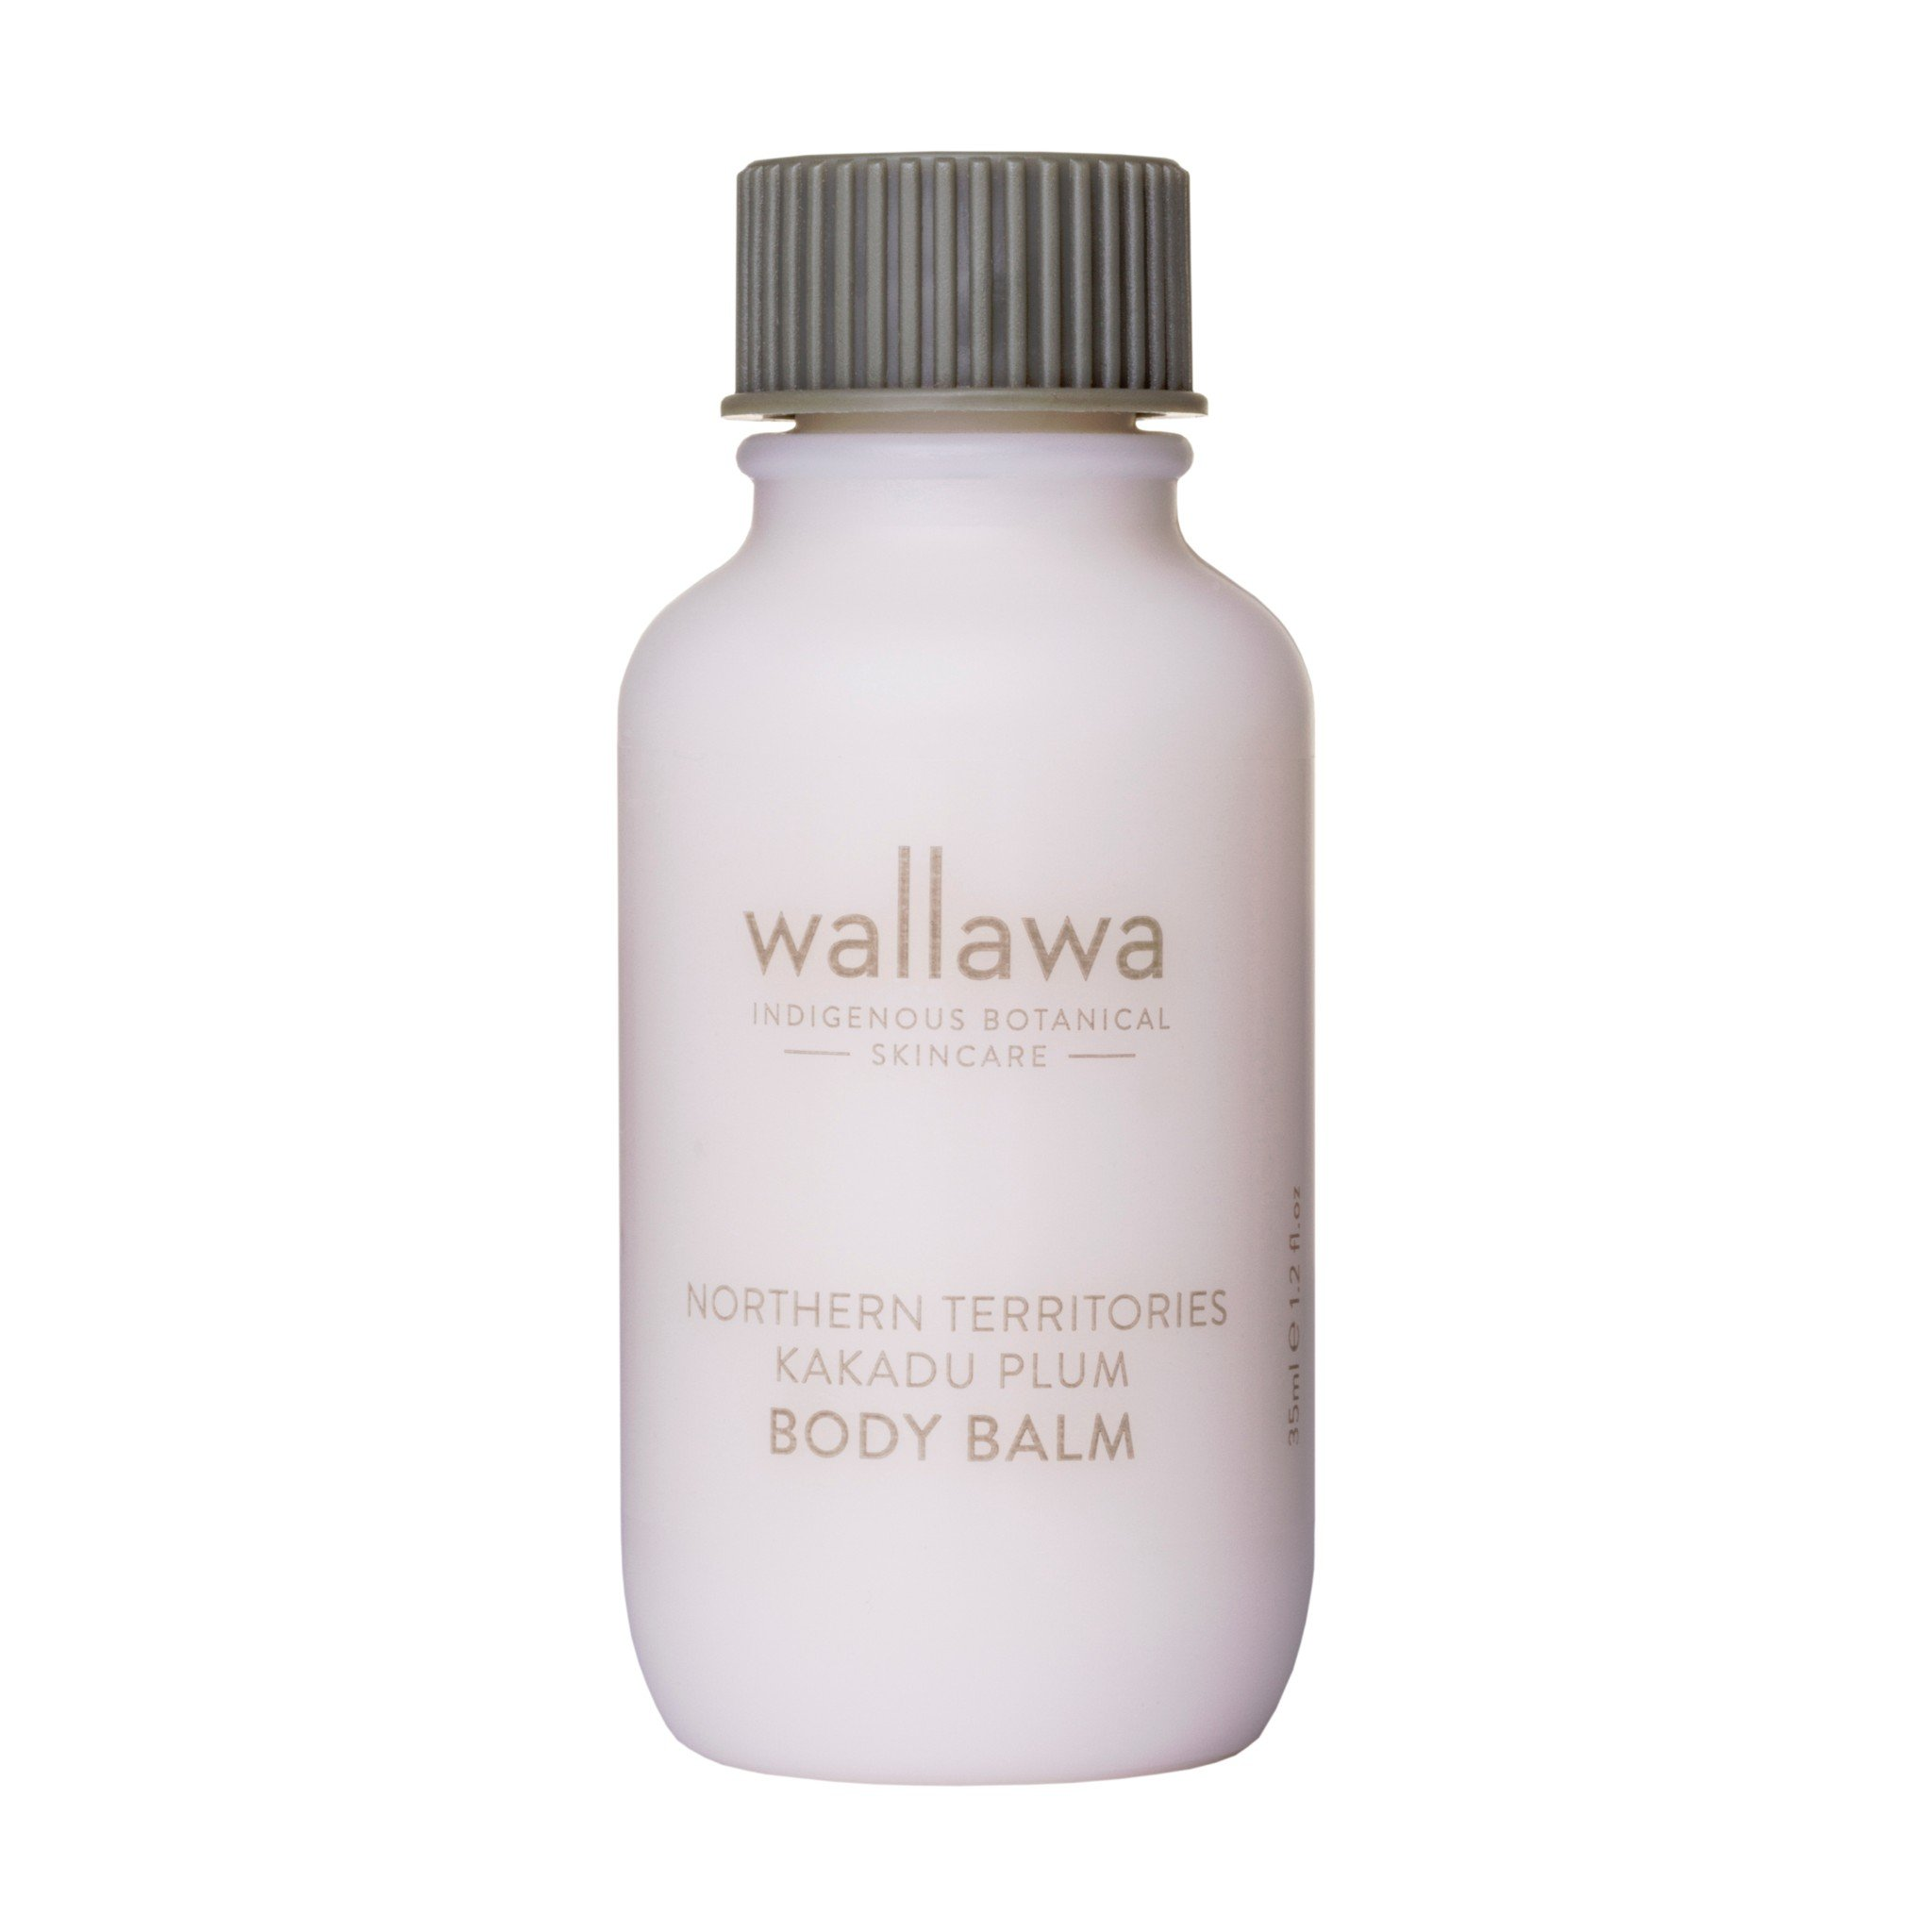 Wallawa Body Balm (50 units)